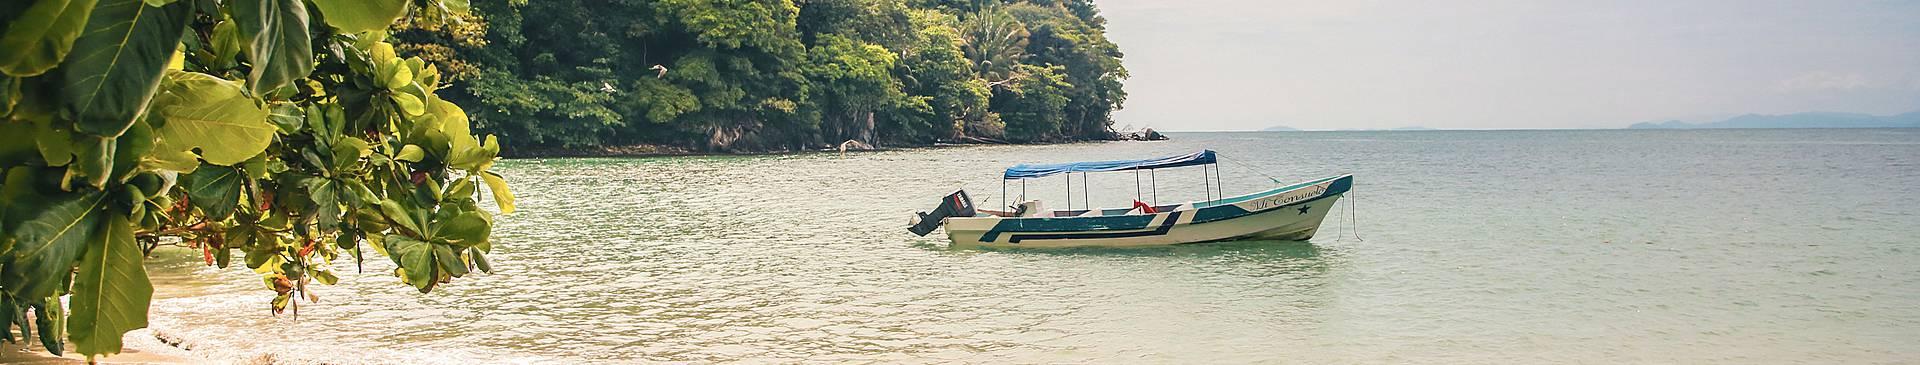 Voyage plage au Honduras